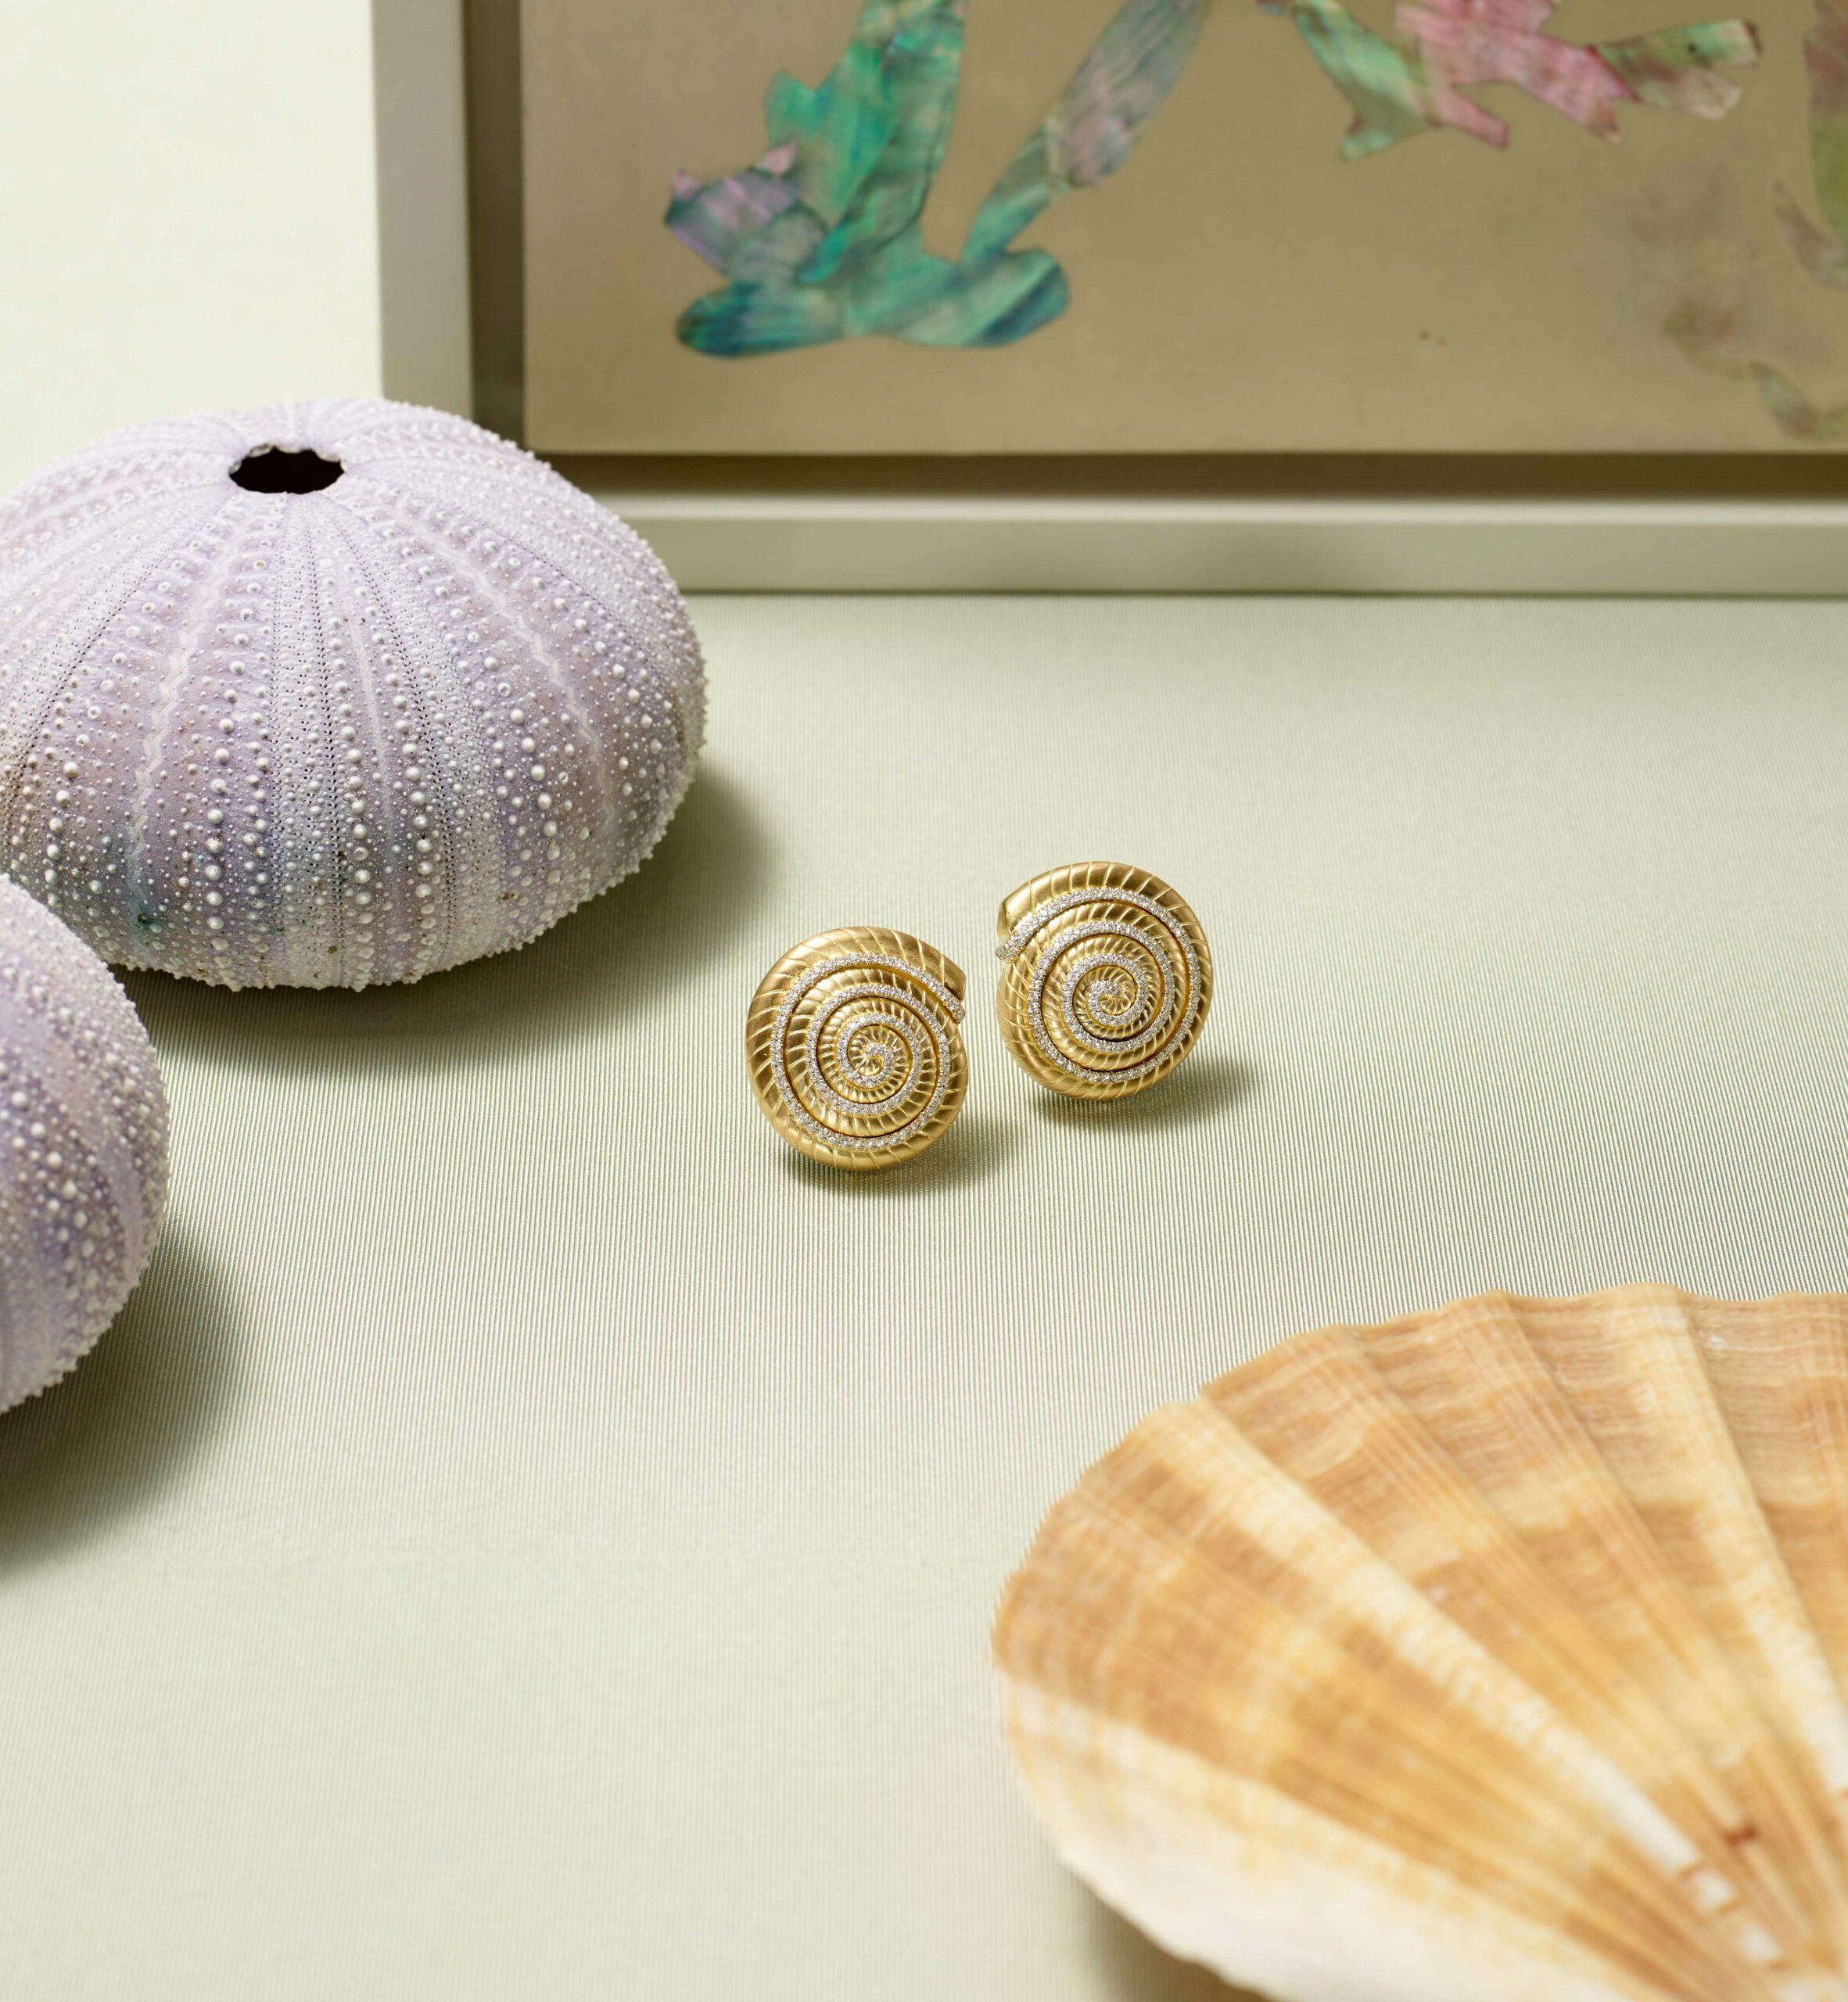 mish_products_earrings_Cabana-Nautilus-ER-Editorial-1_resize